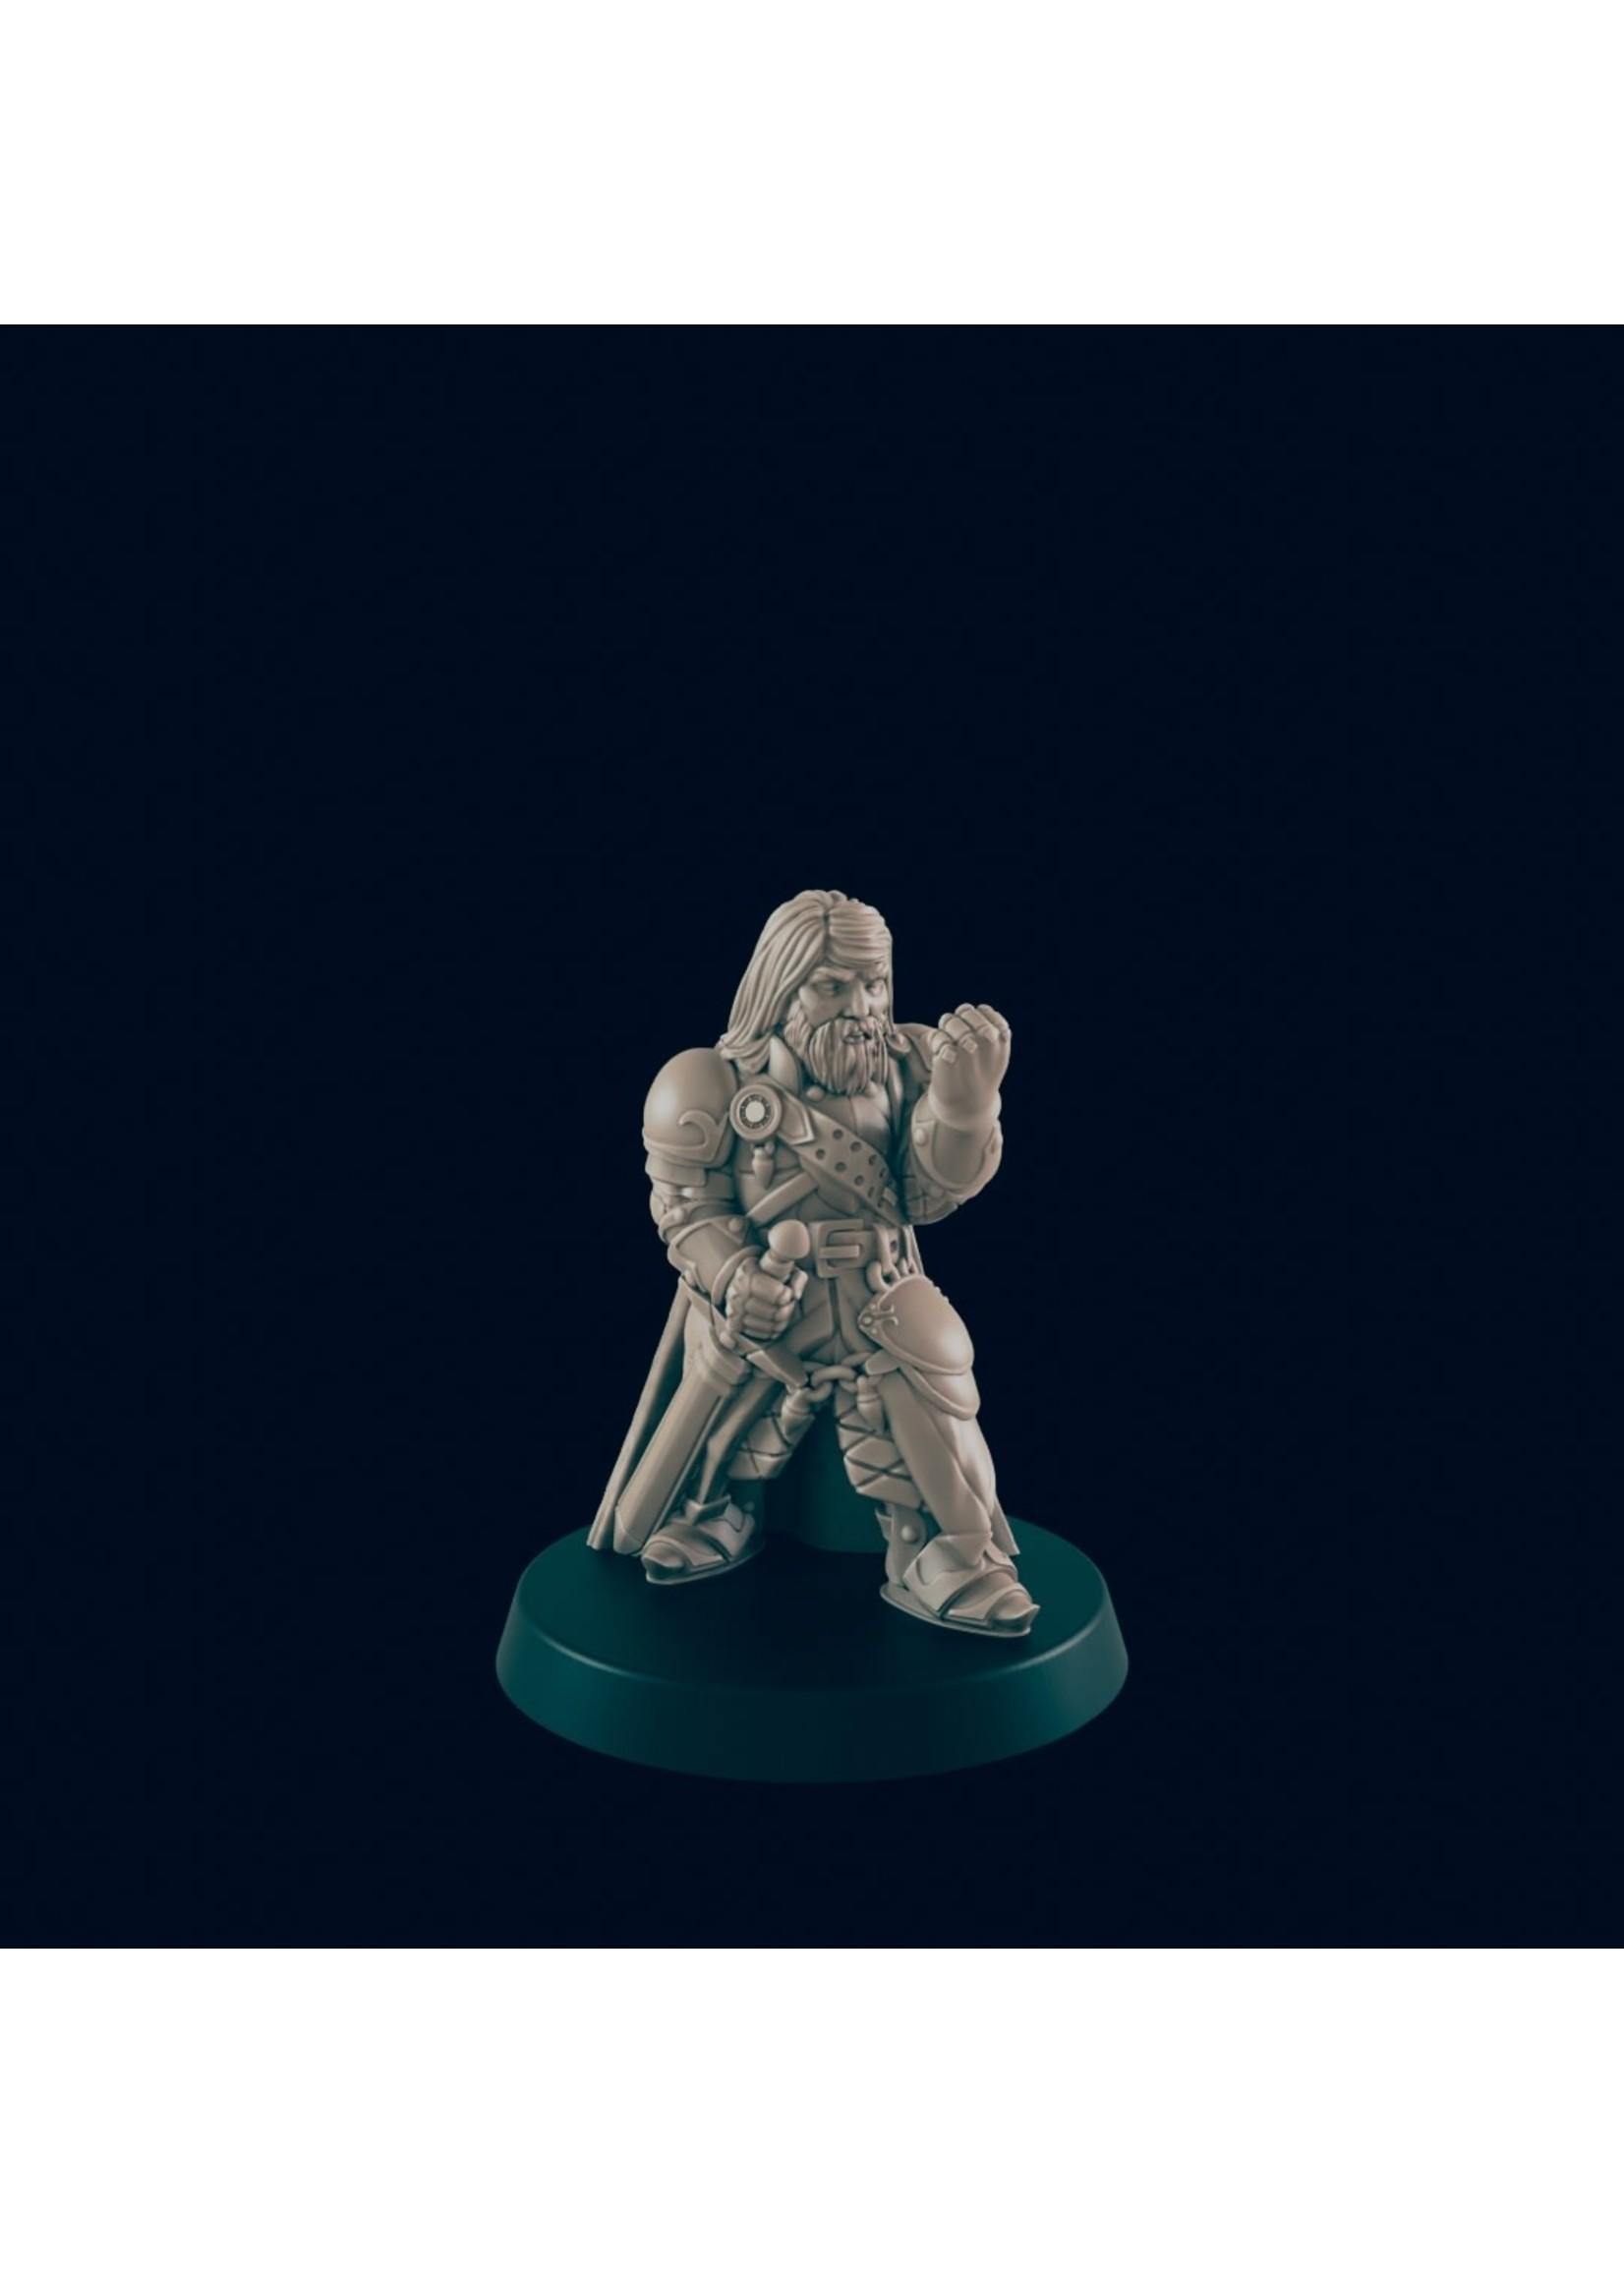 3D Printed Miniature - Guard Captain - Dungeons & Dragons - Beasts and Baddies KS